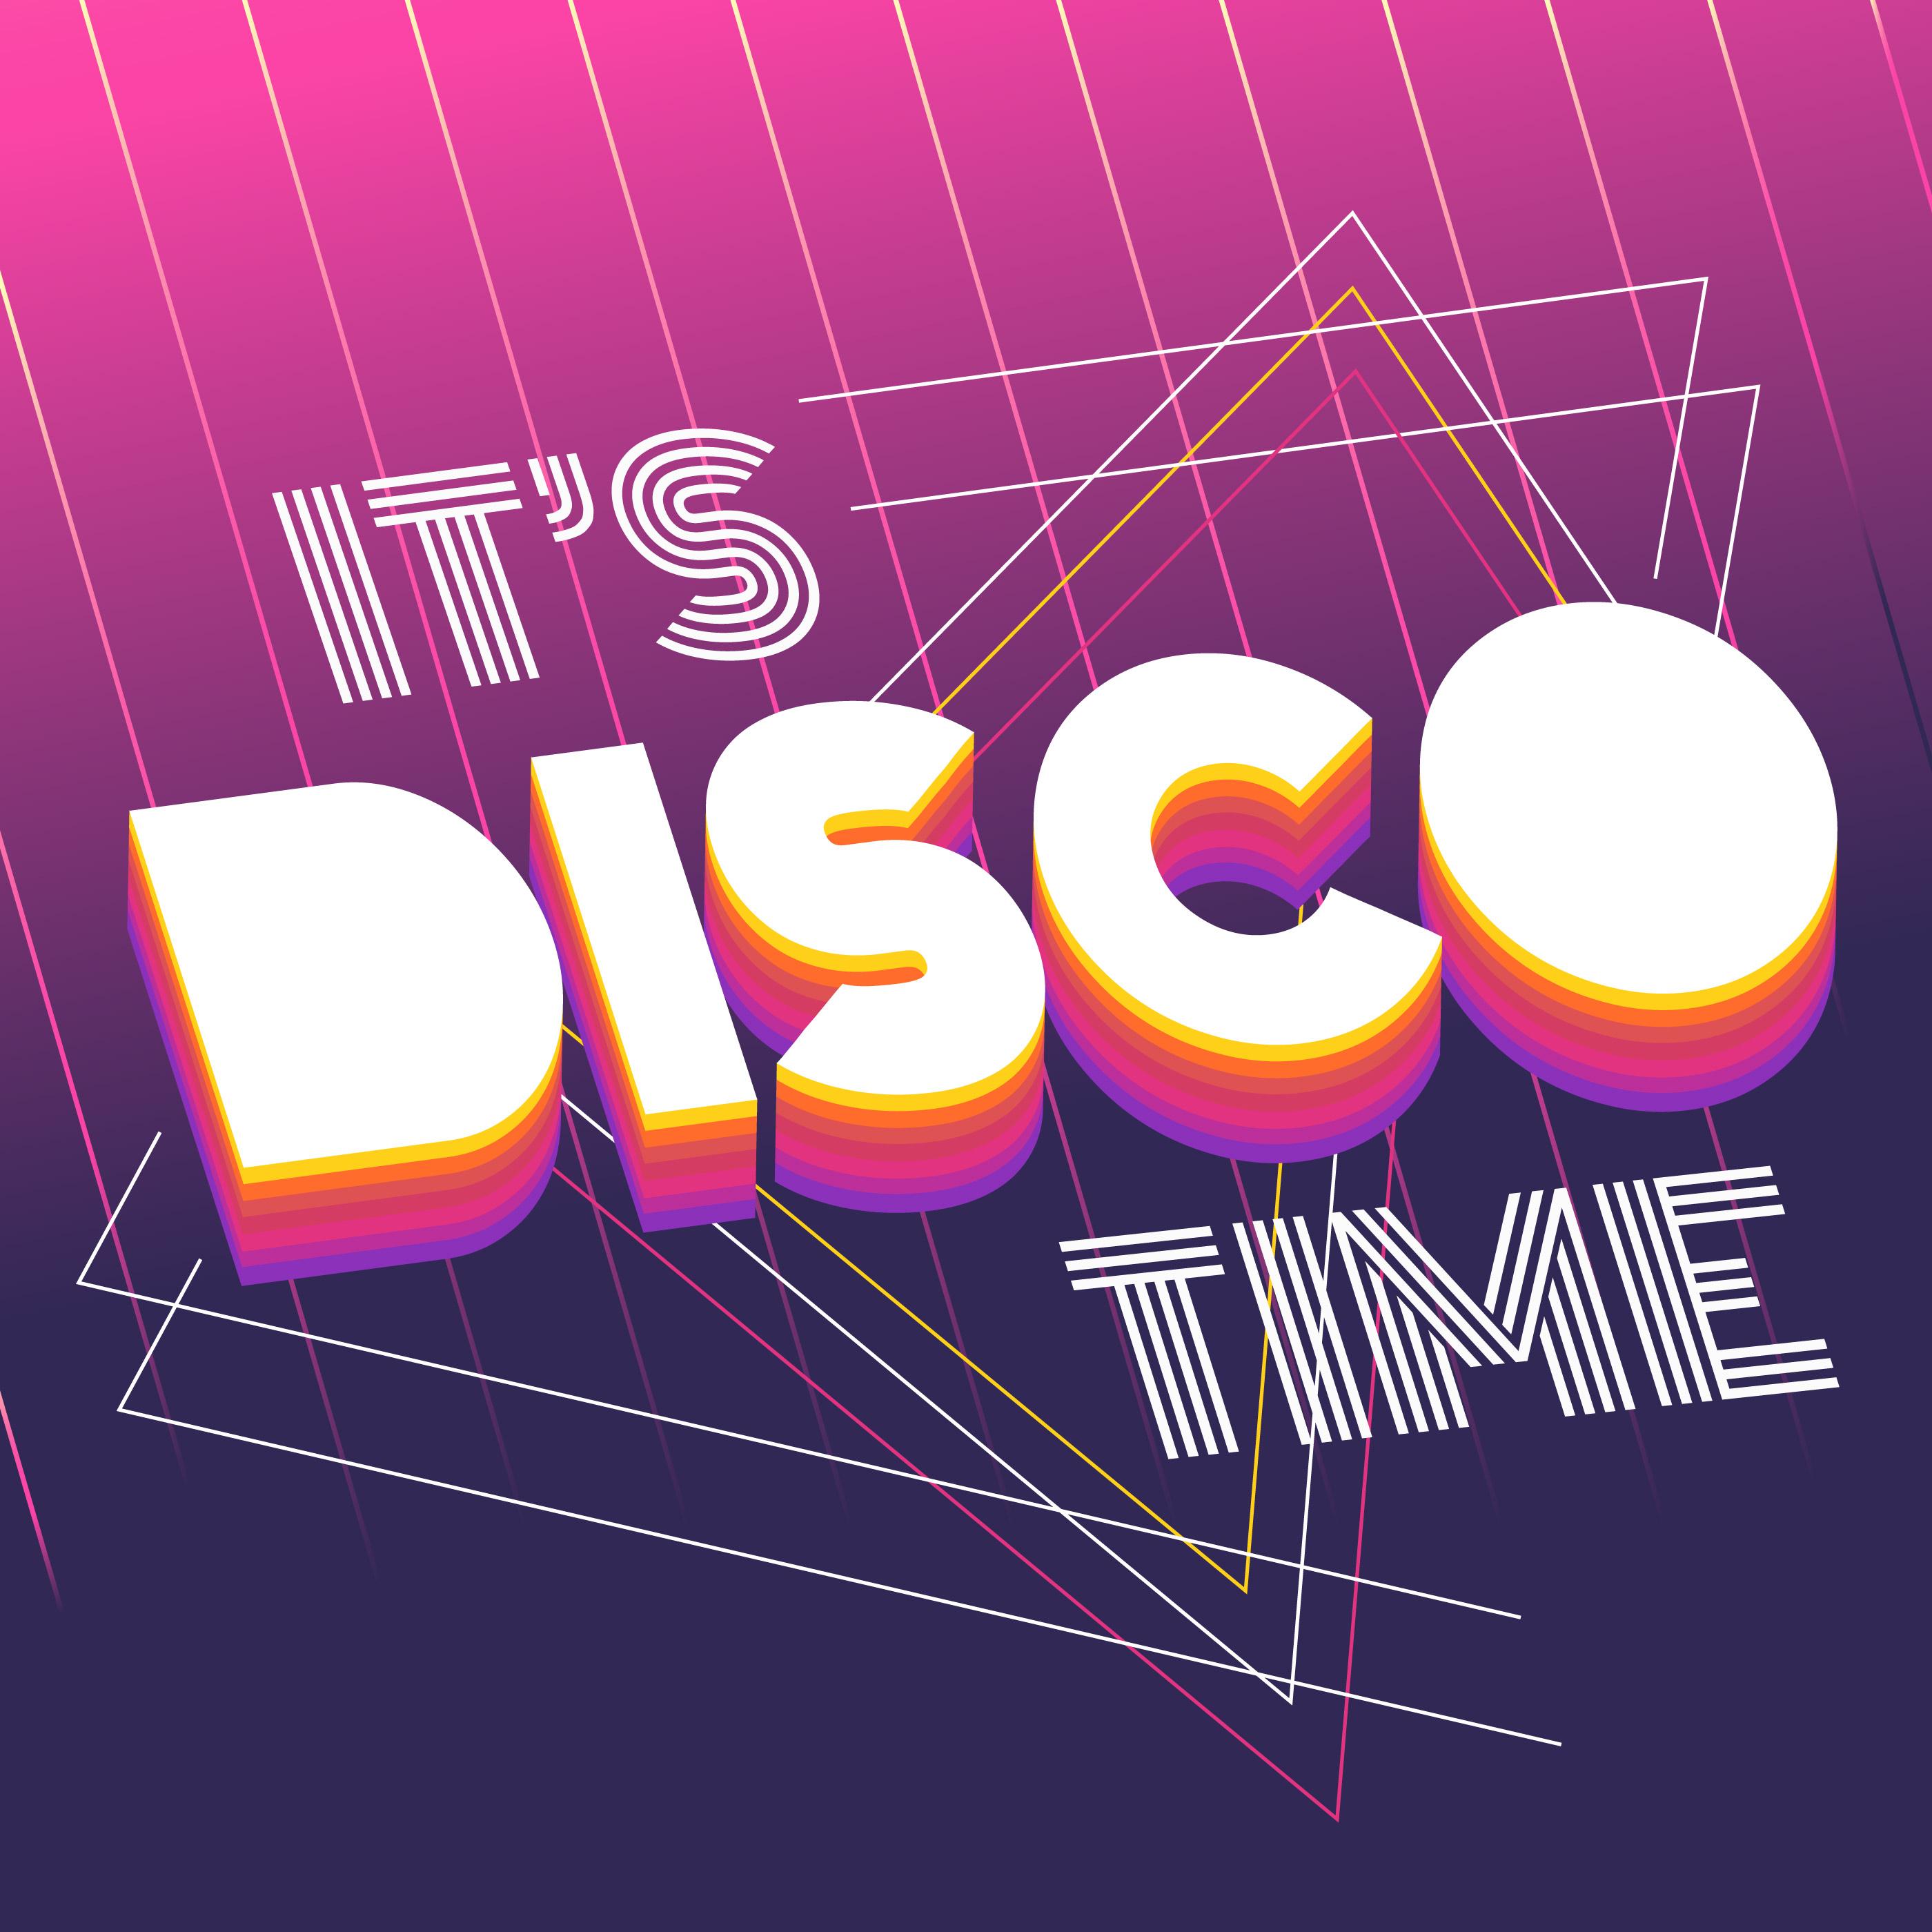 it u2019s disco time typography